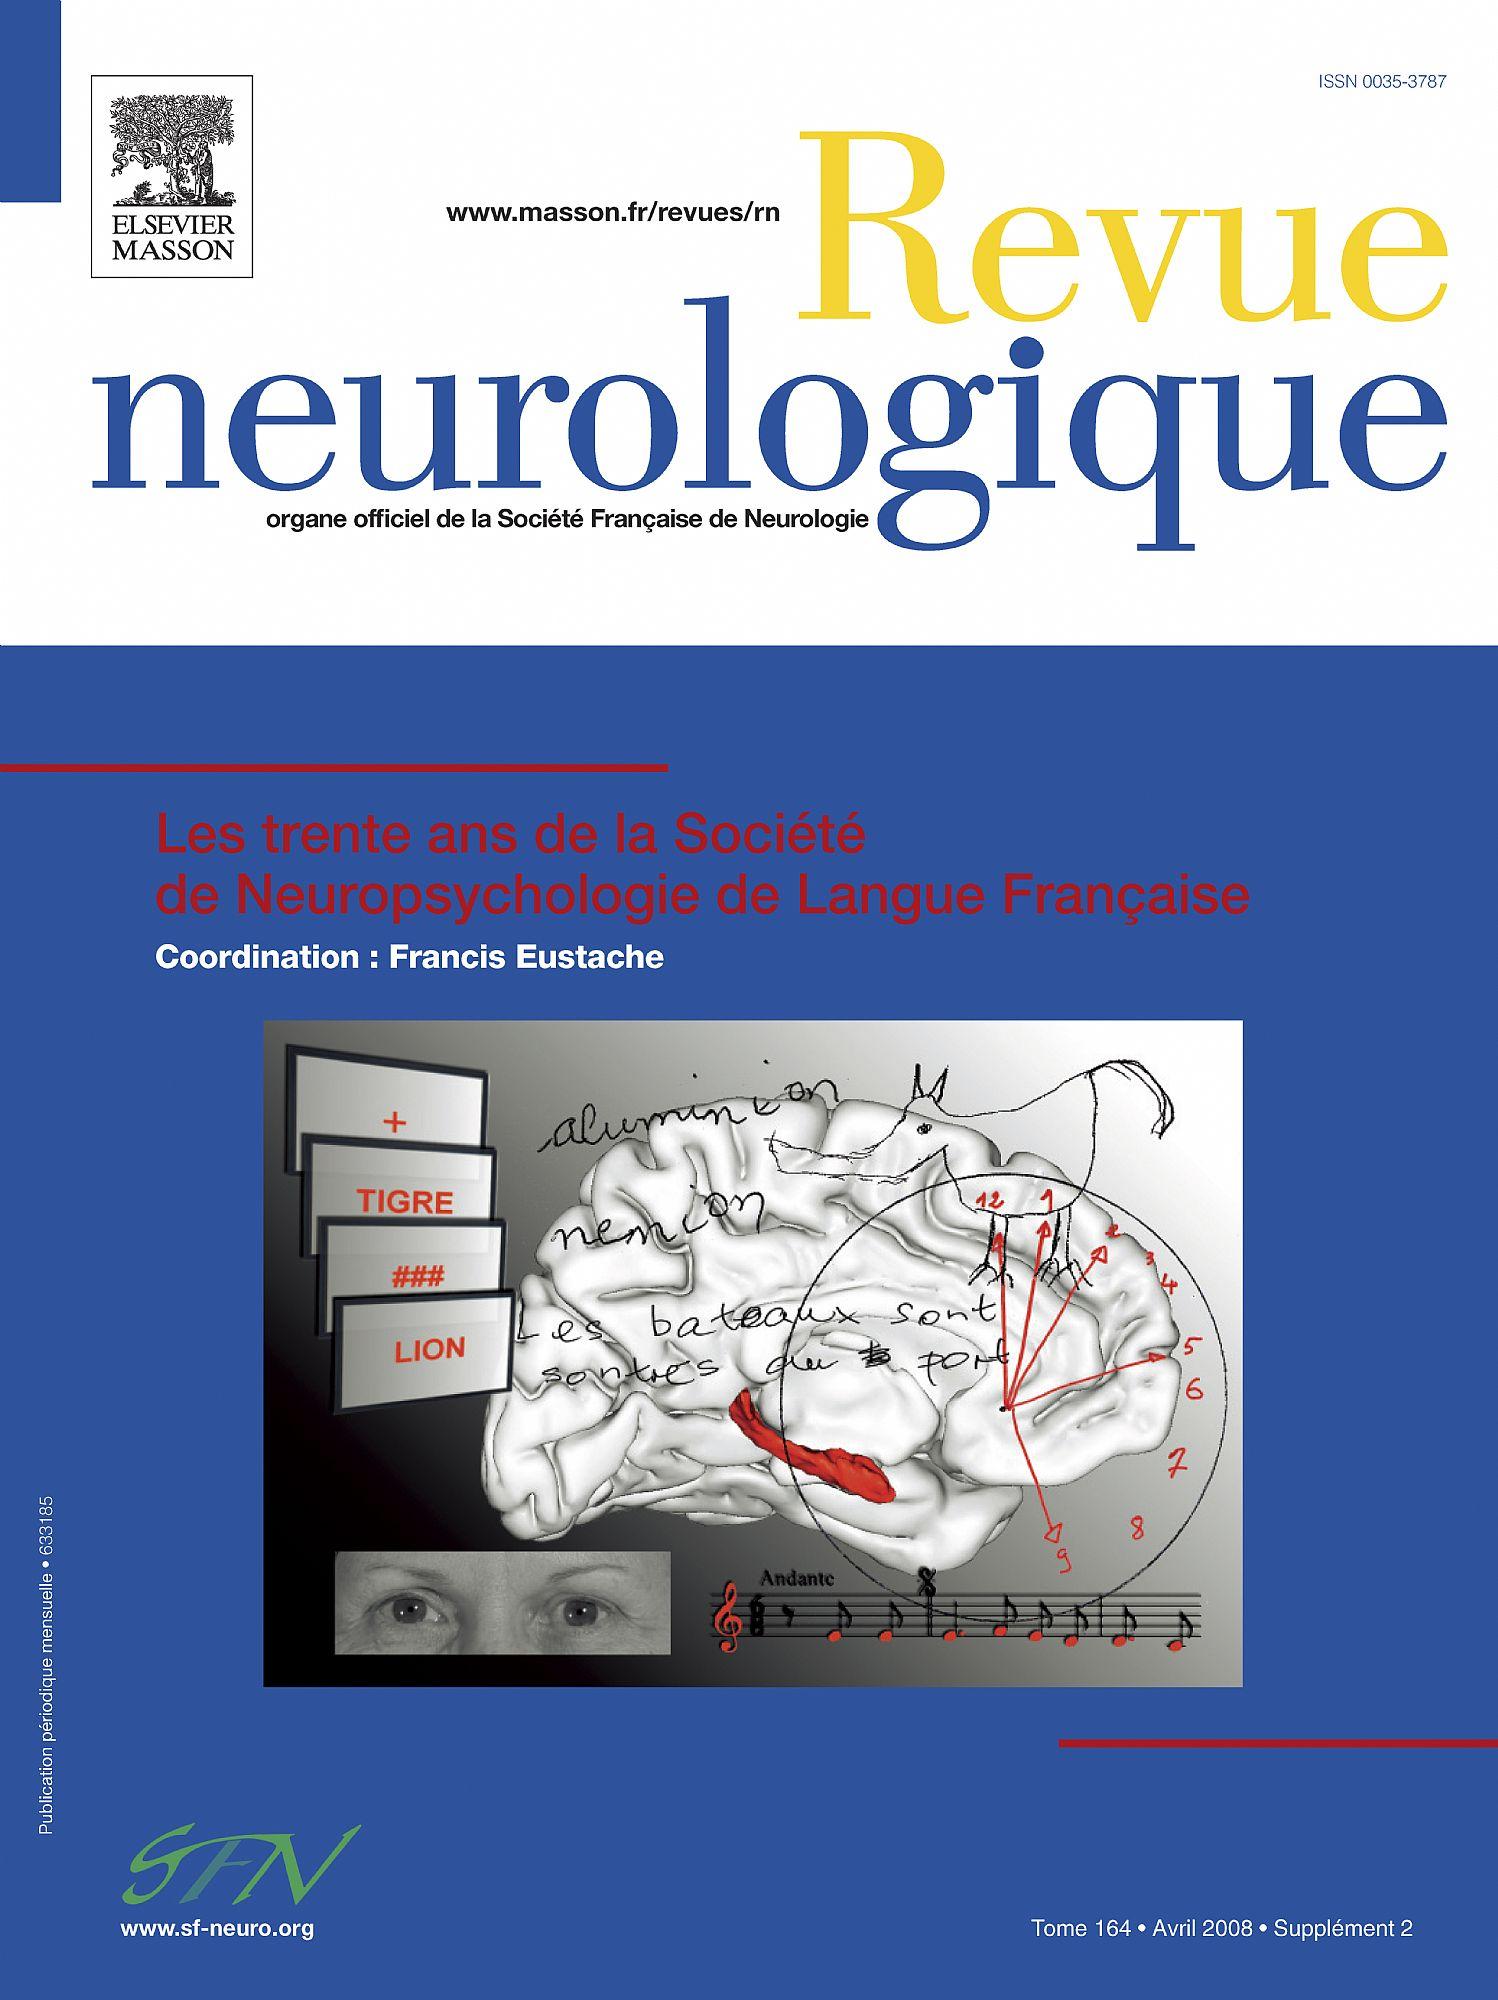 Revue Neurologique, mars 2009